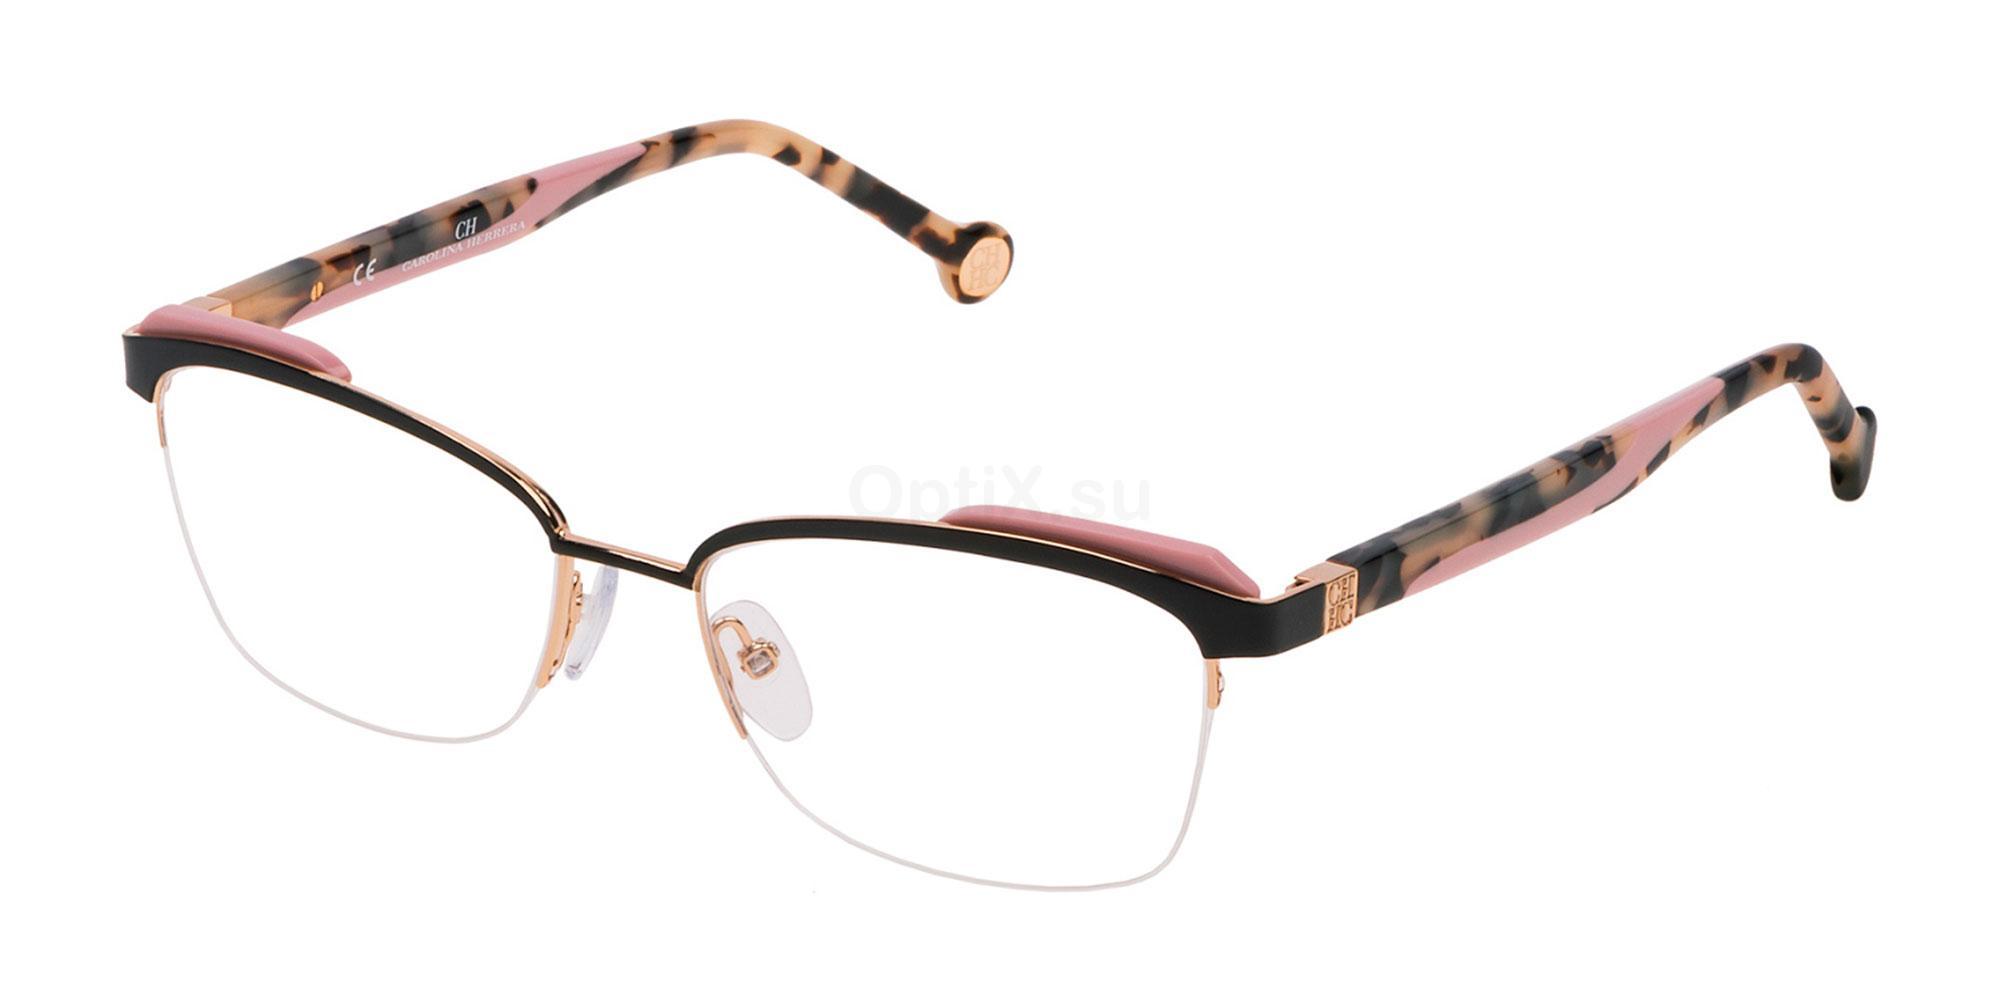 0301 VHE111 Glasses, CH Carolina Herrera